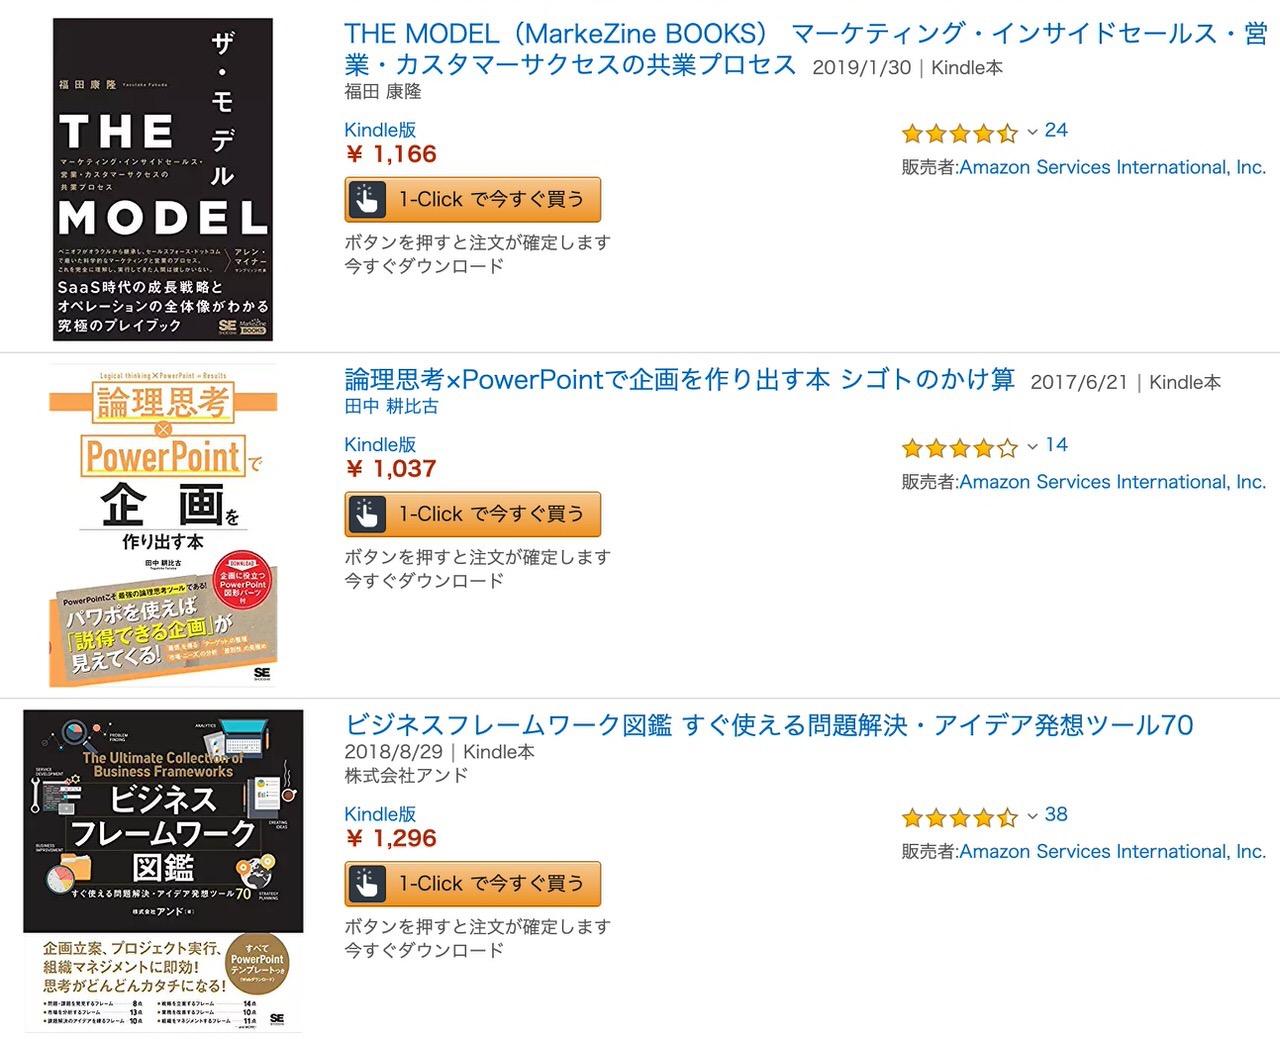 【Kindleセール】1,000冊以上が対象!40%オフ「翔泳社春の電書祭り」 フェア開催中(5/9まで)